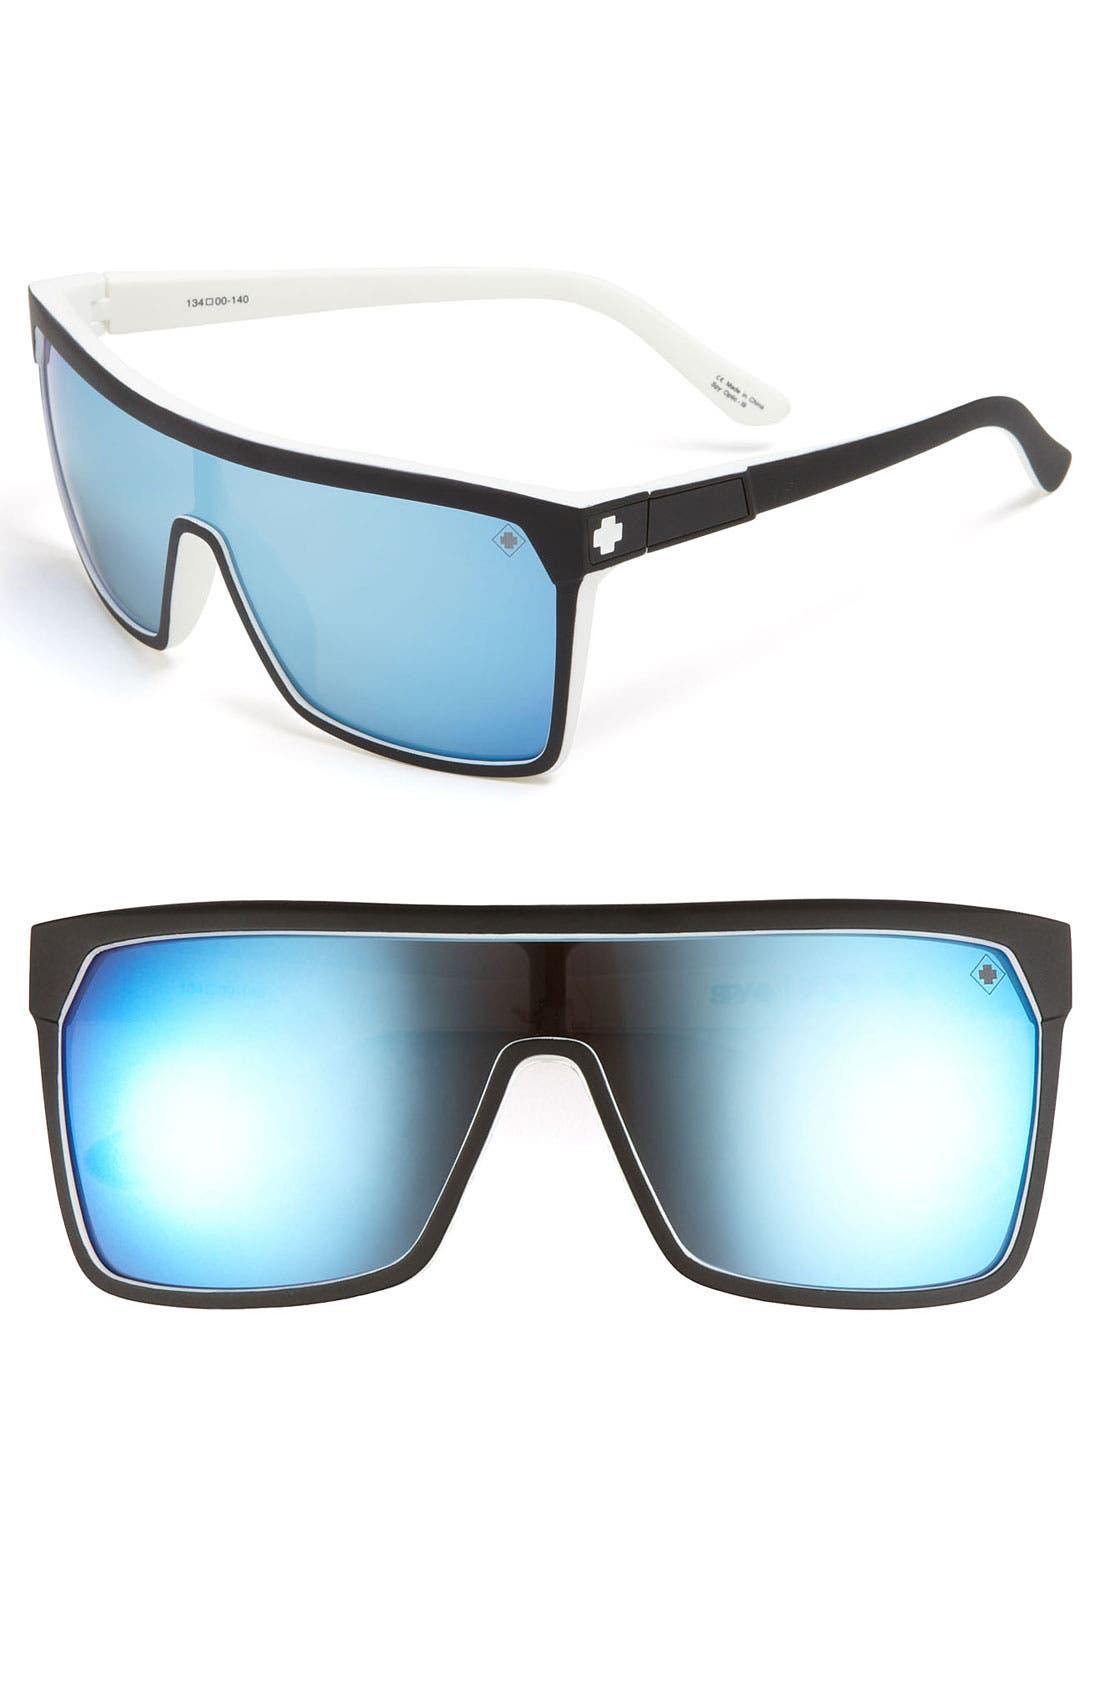 Alternate Image 1 Selected - SPY Optic 'Whitewall Series - Flynn' Sunglasses